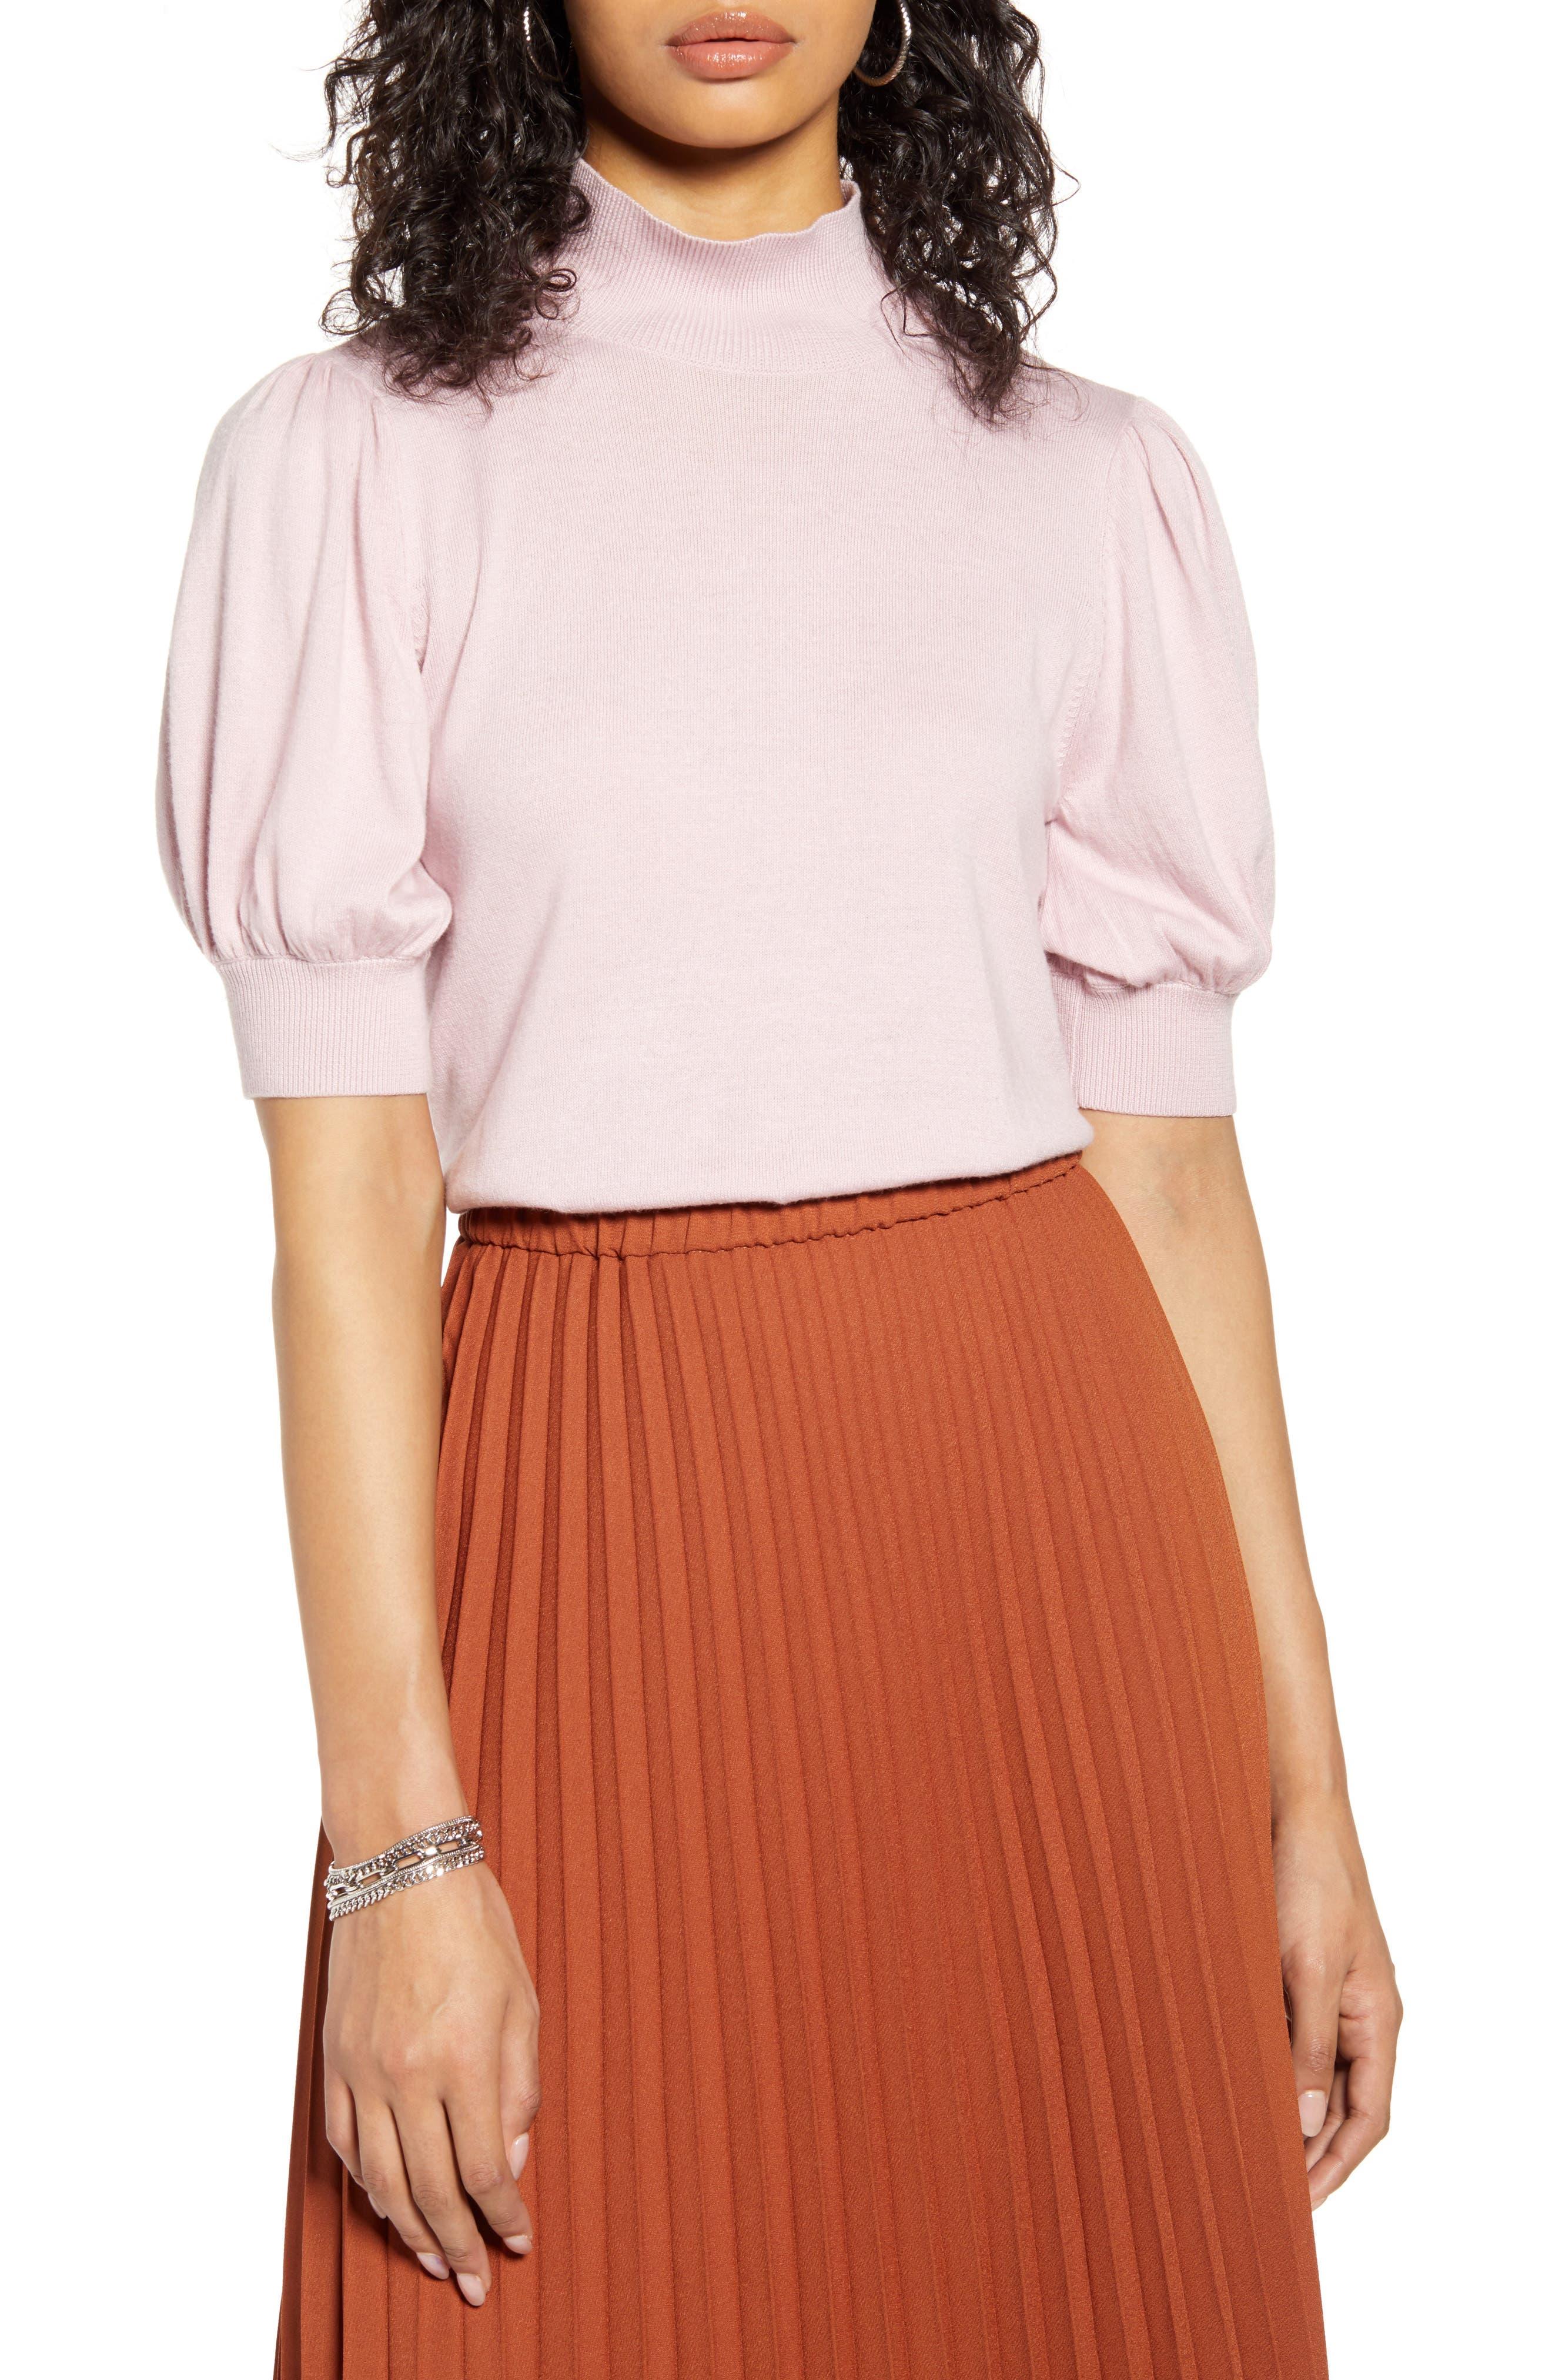 1930s Style Blouses, Shirts, Tops | Vintage Blouses Womens Halogen Mock Neck Puff Shoulder Sweater Size X-Large - Purple $41.40 AT vintagedancer.com